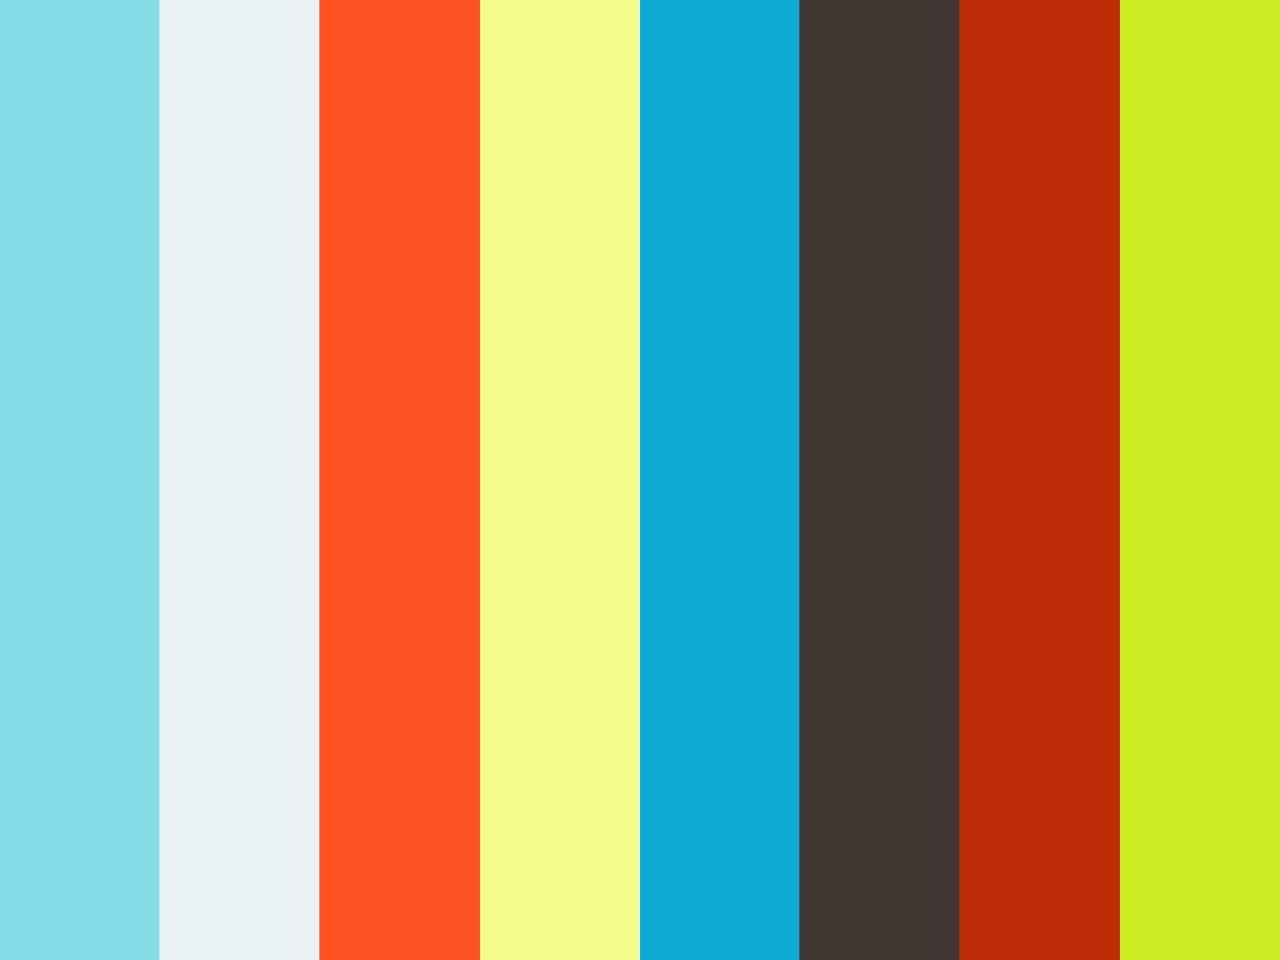 KultuFyn sender fynsk kultur på FynboTV